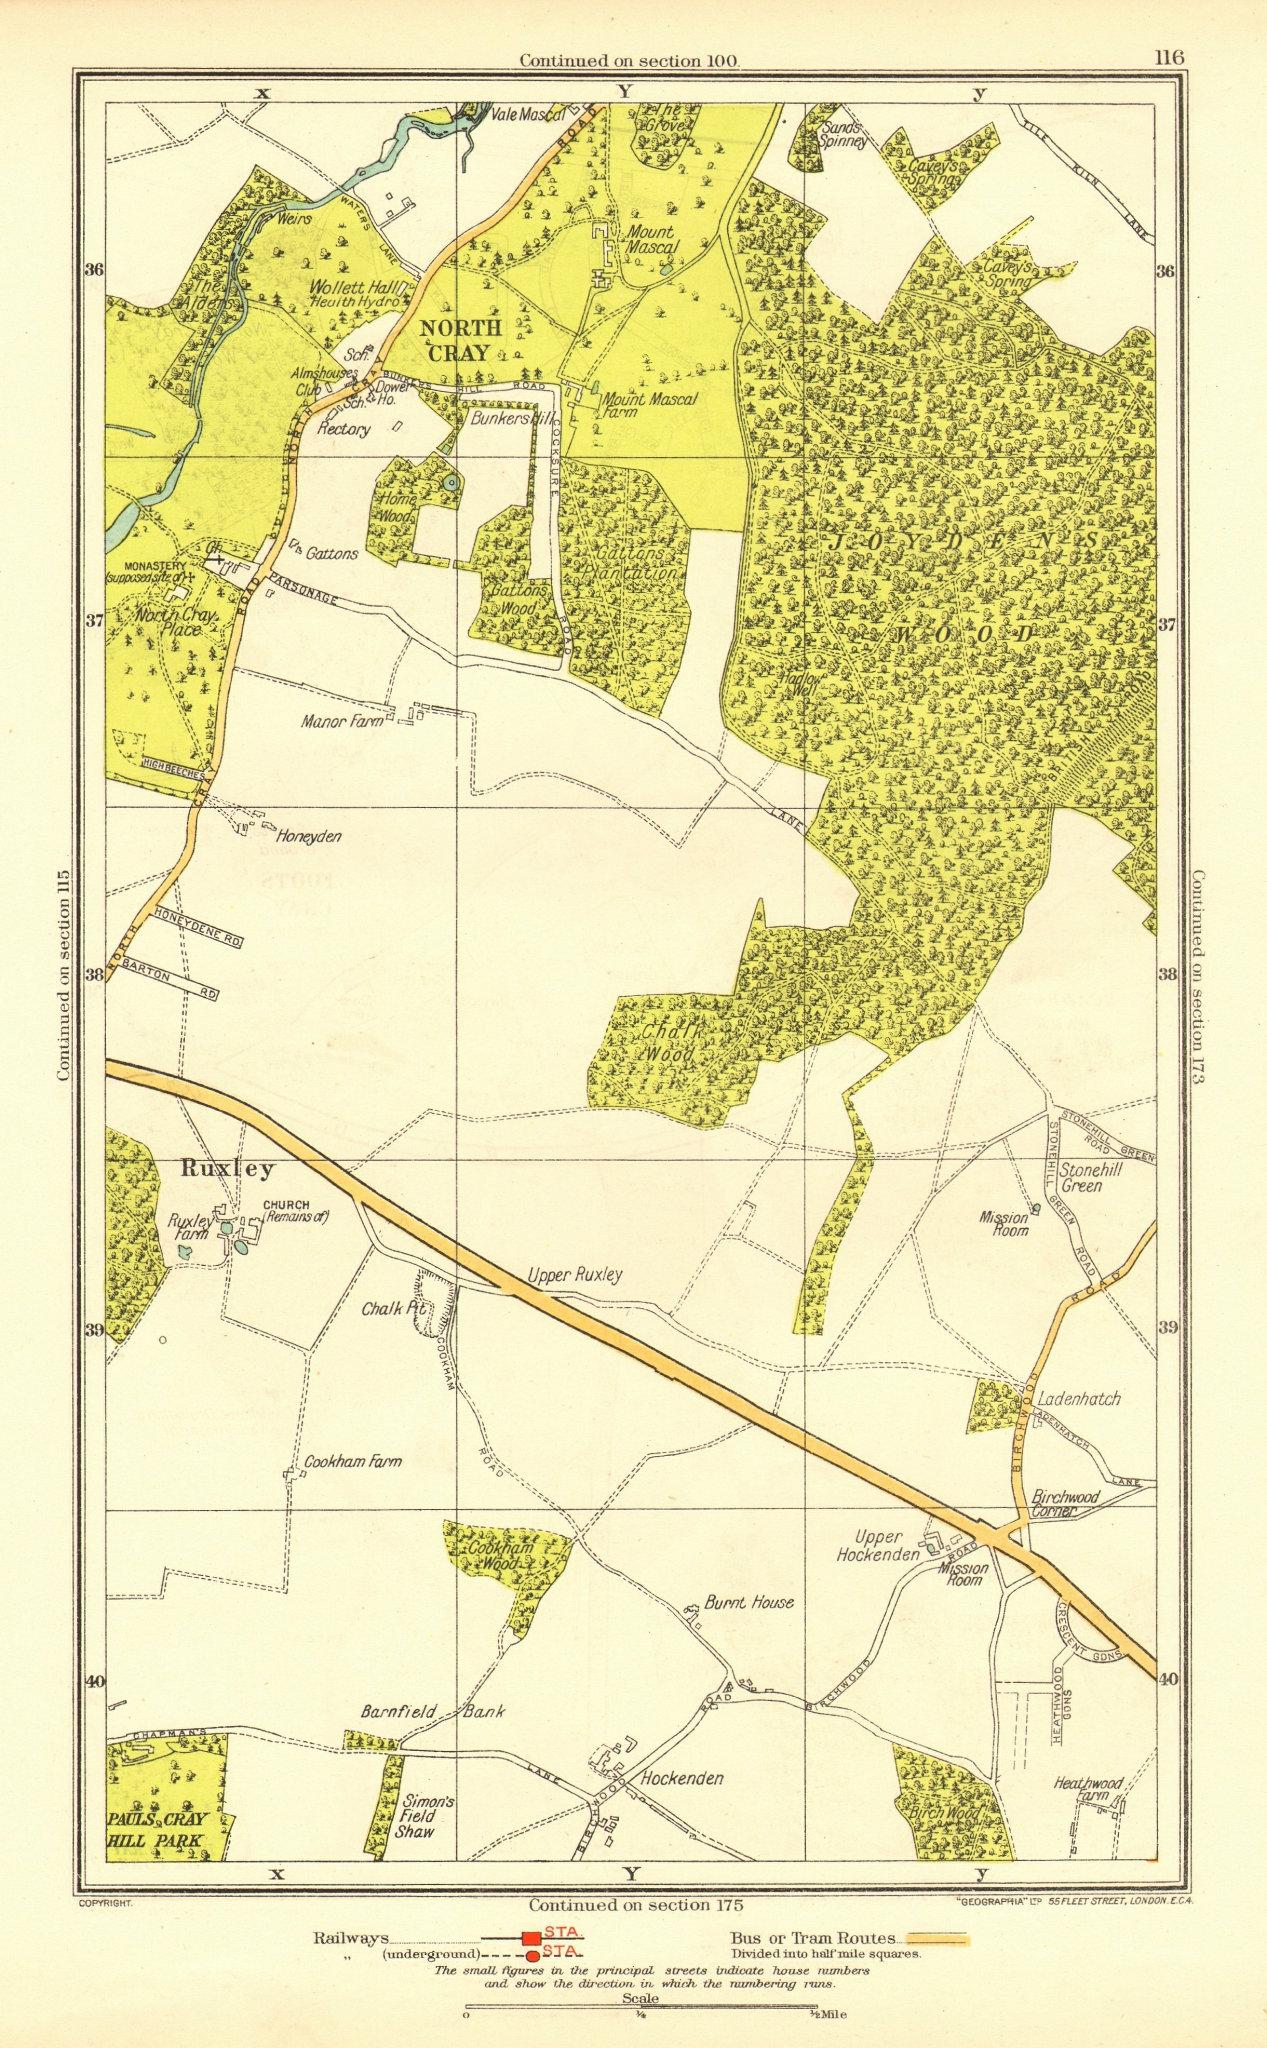 Associate Product JOYDEN'S WOOD. North Cray Foot's Cray Ruxley Swanley 1937 old vintage map